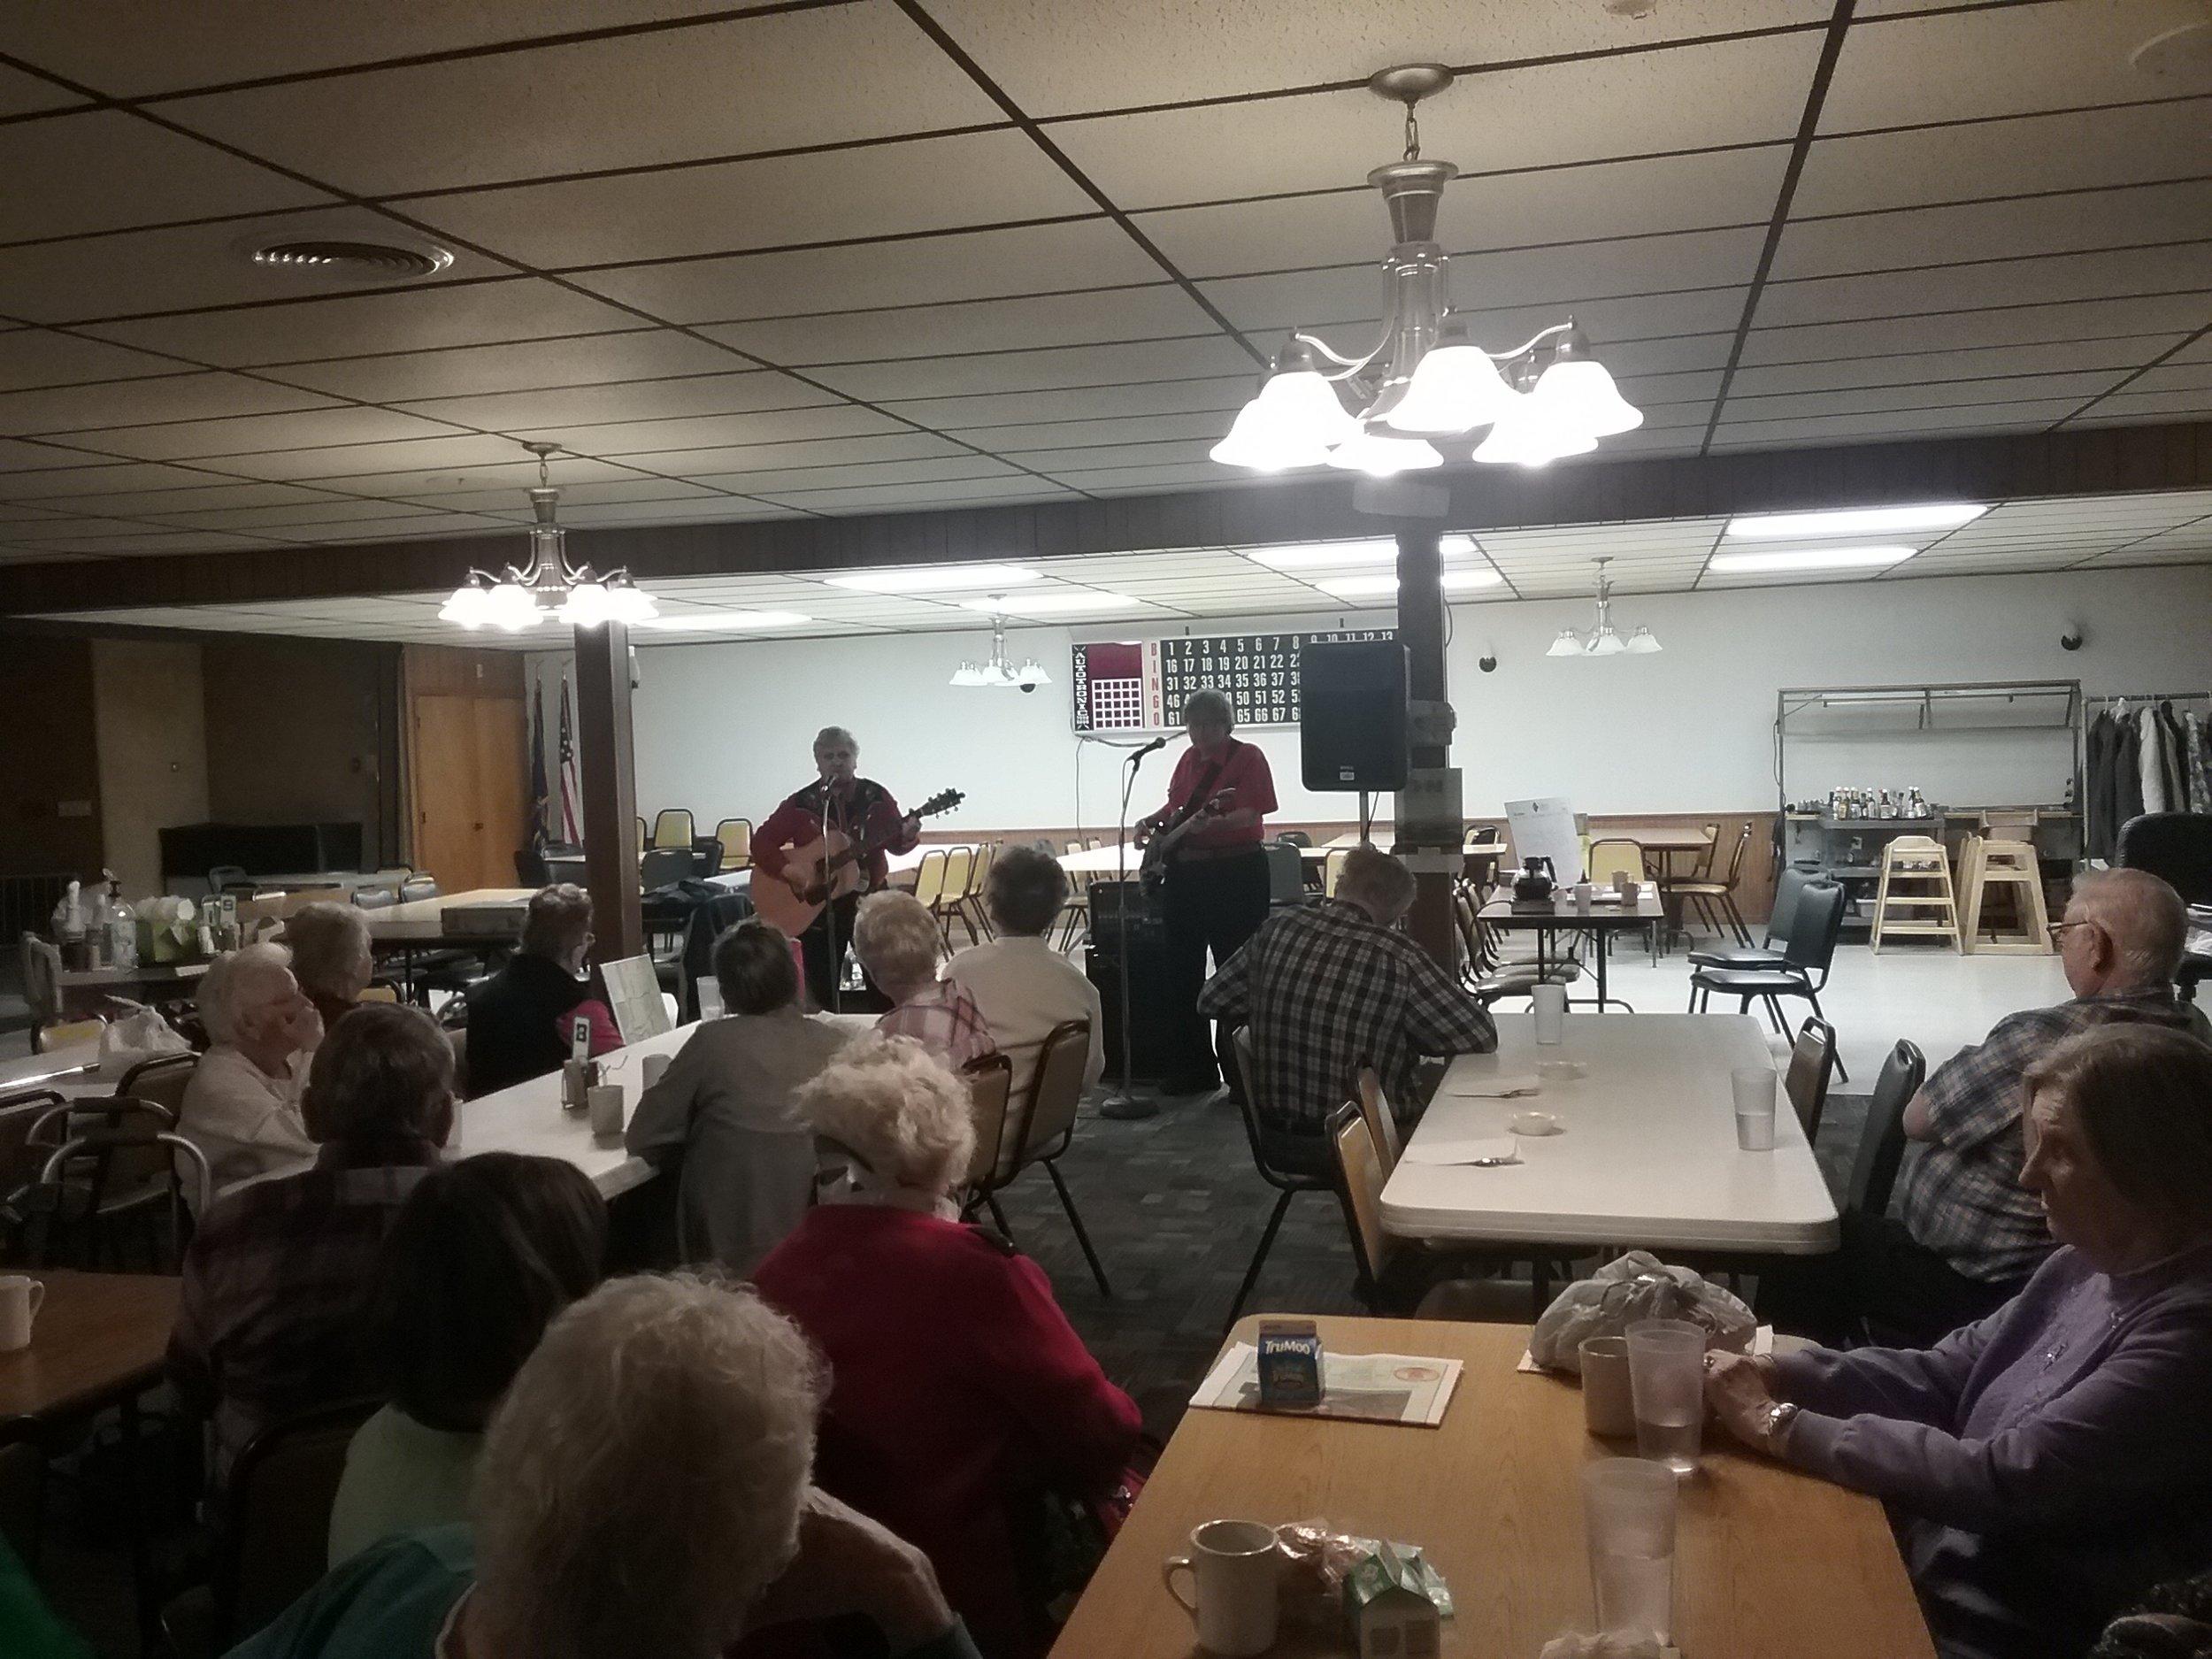 Entertainment at Wymore Senior Center